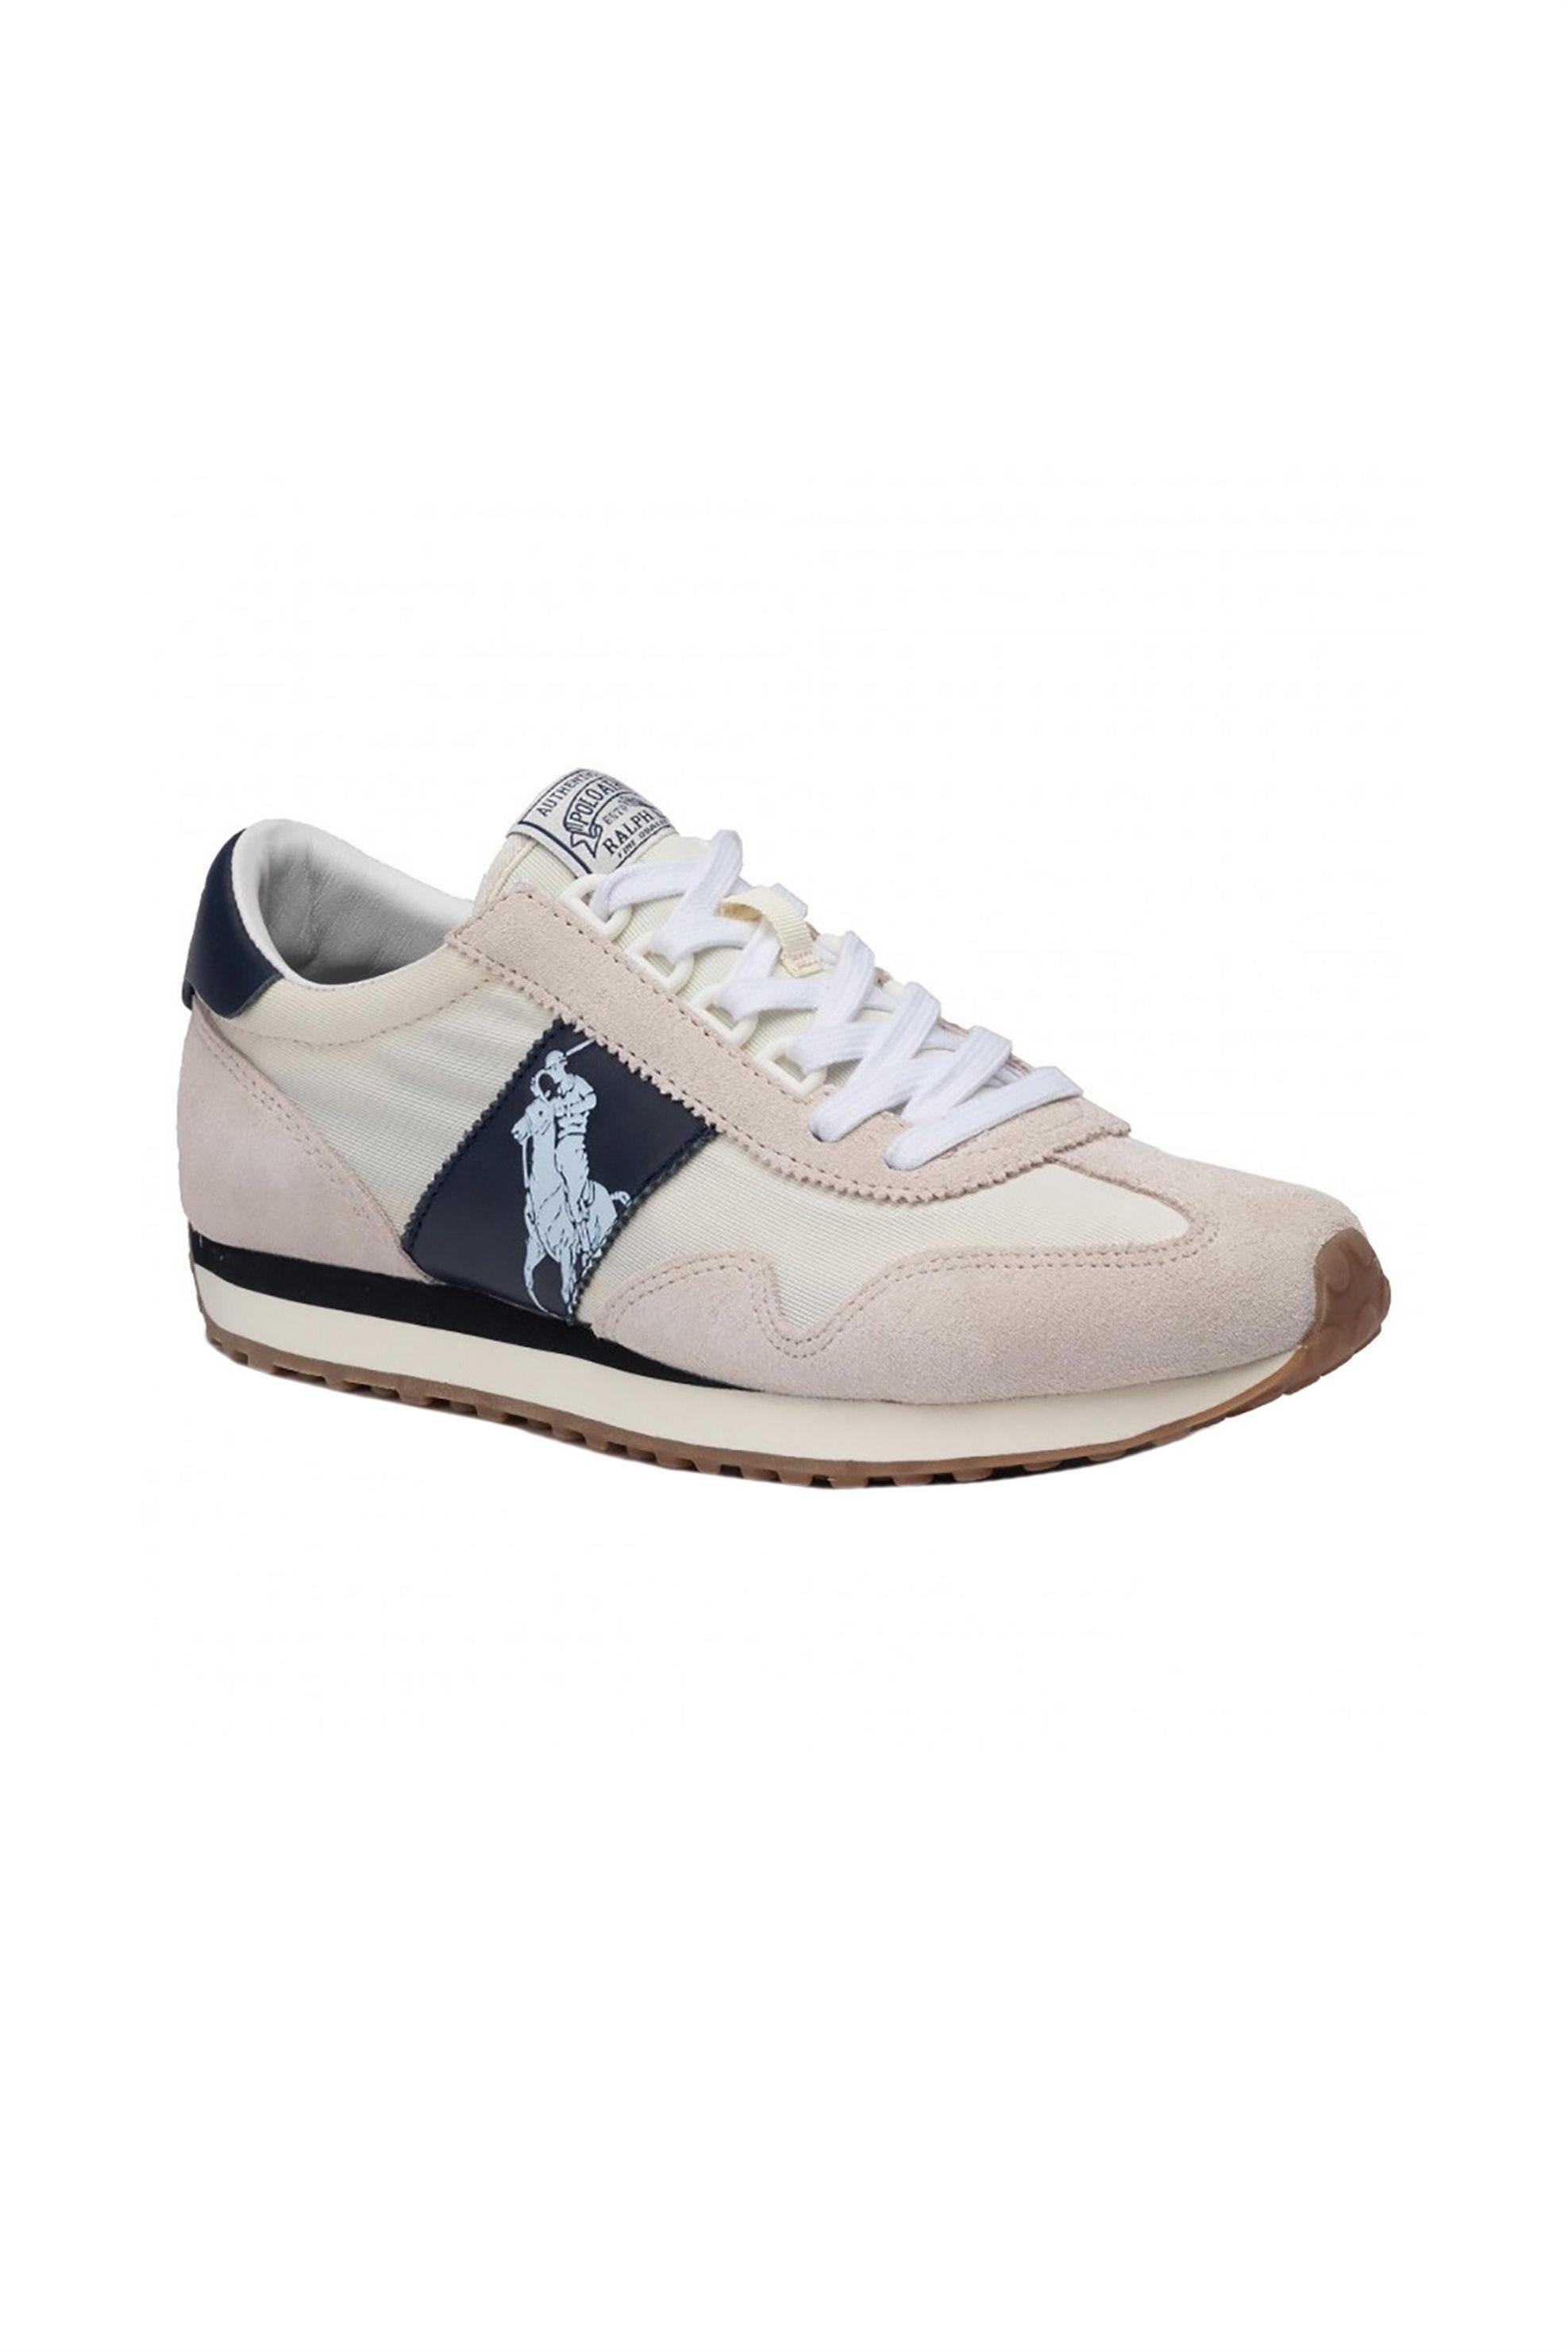 Polo Ralph Lauren ανδρικά suede sneakers με κορδόνια και suede υφή – 809755192003 – Μπεζ